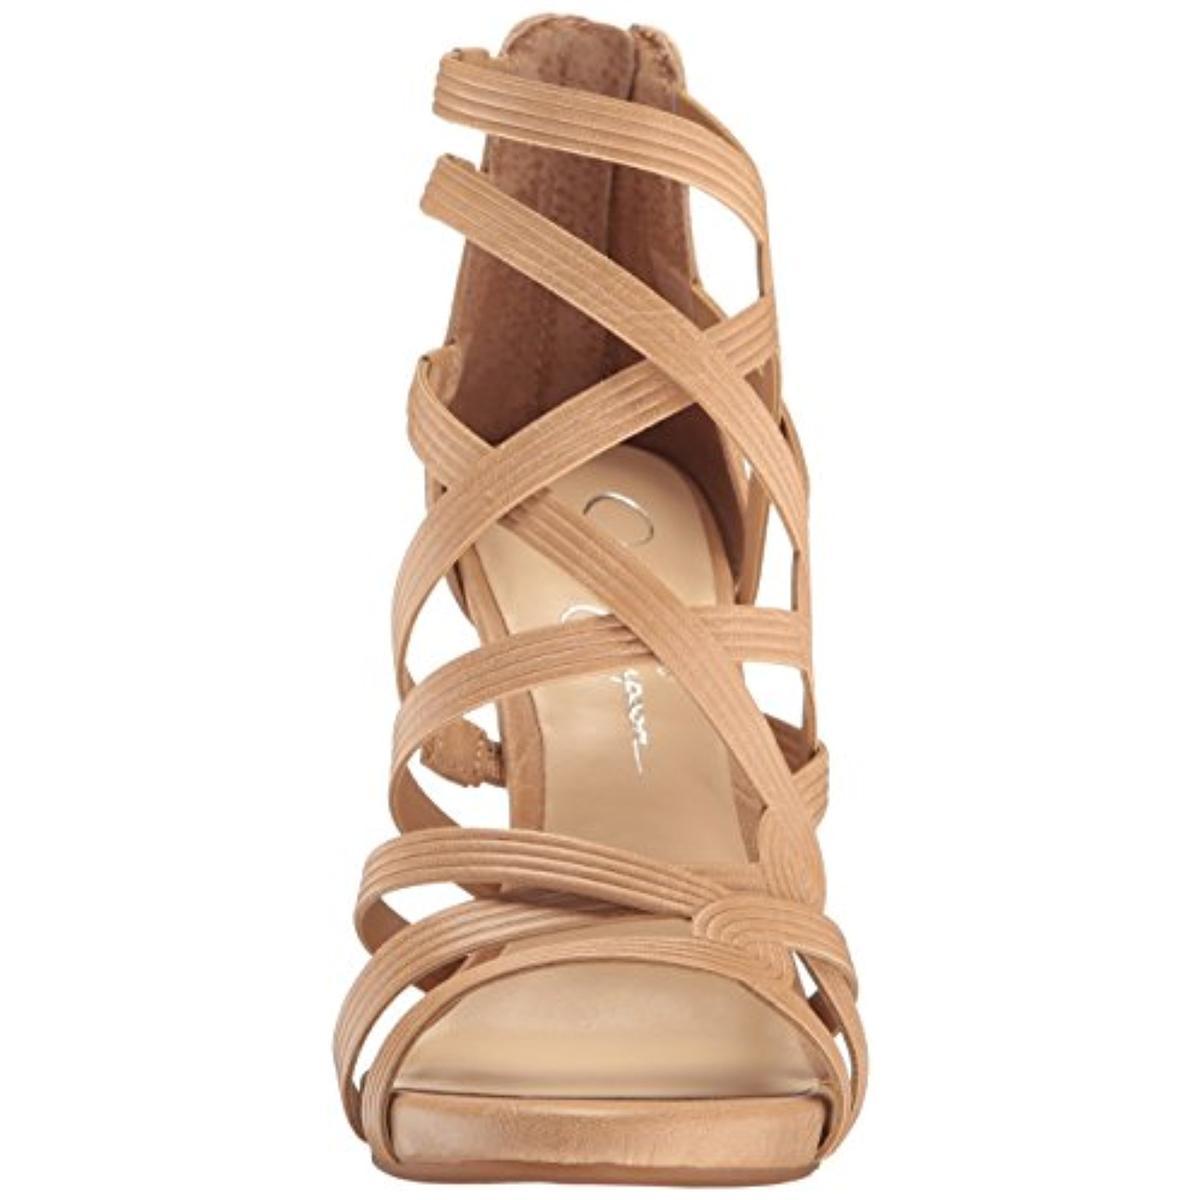 Jessica Simpson Tan Damenschuhe Rainah Tan Simpson Open Toe Heels Schuhes 9 Medium (B,M) BHFO 0219 00ff3b